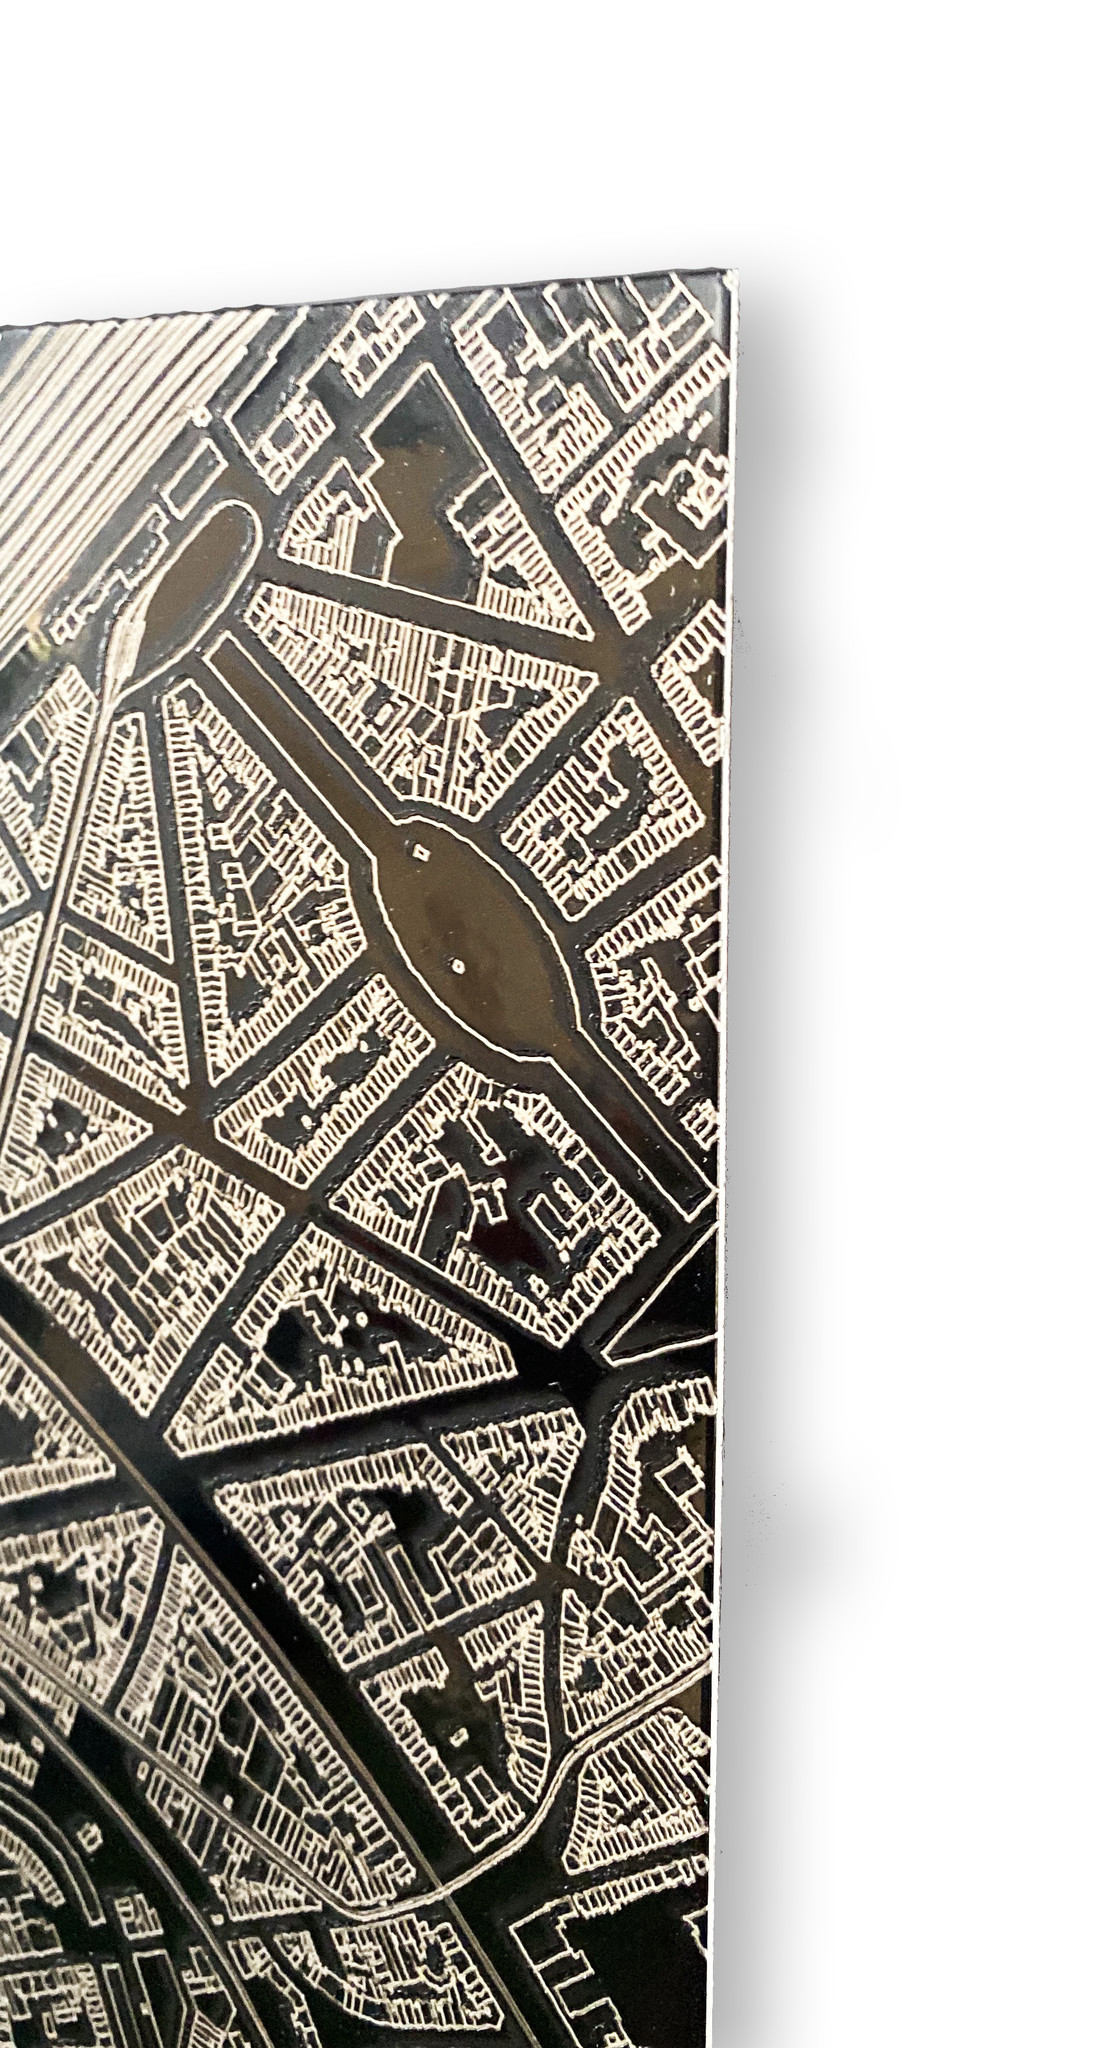 Stadtkarte Zutphen | Aluminium Wanddekoration-5